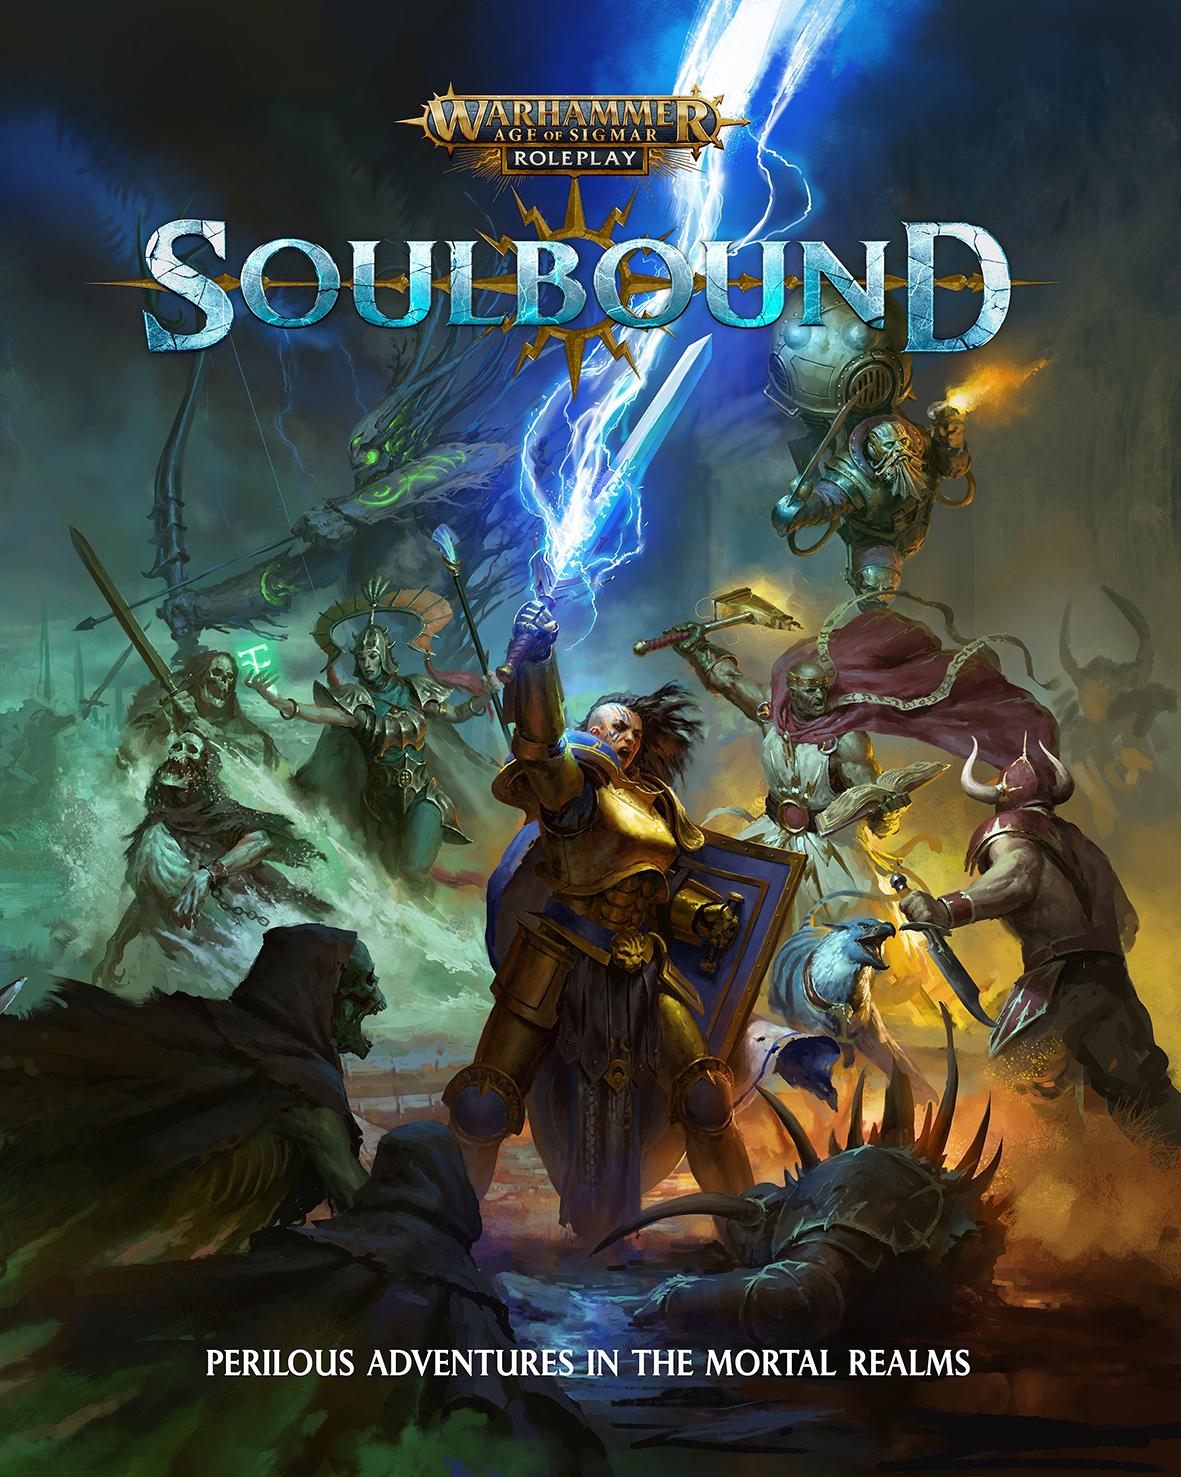 Soulbound: Warhammer Age of Sigmar RPG